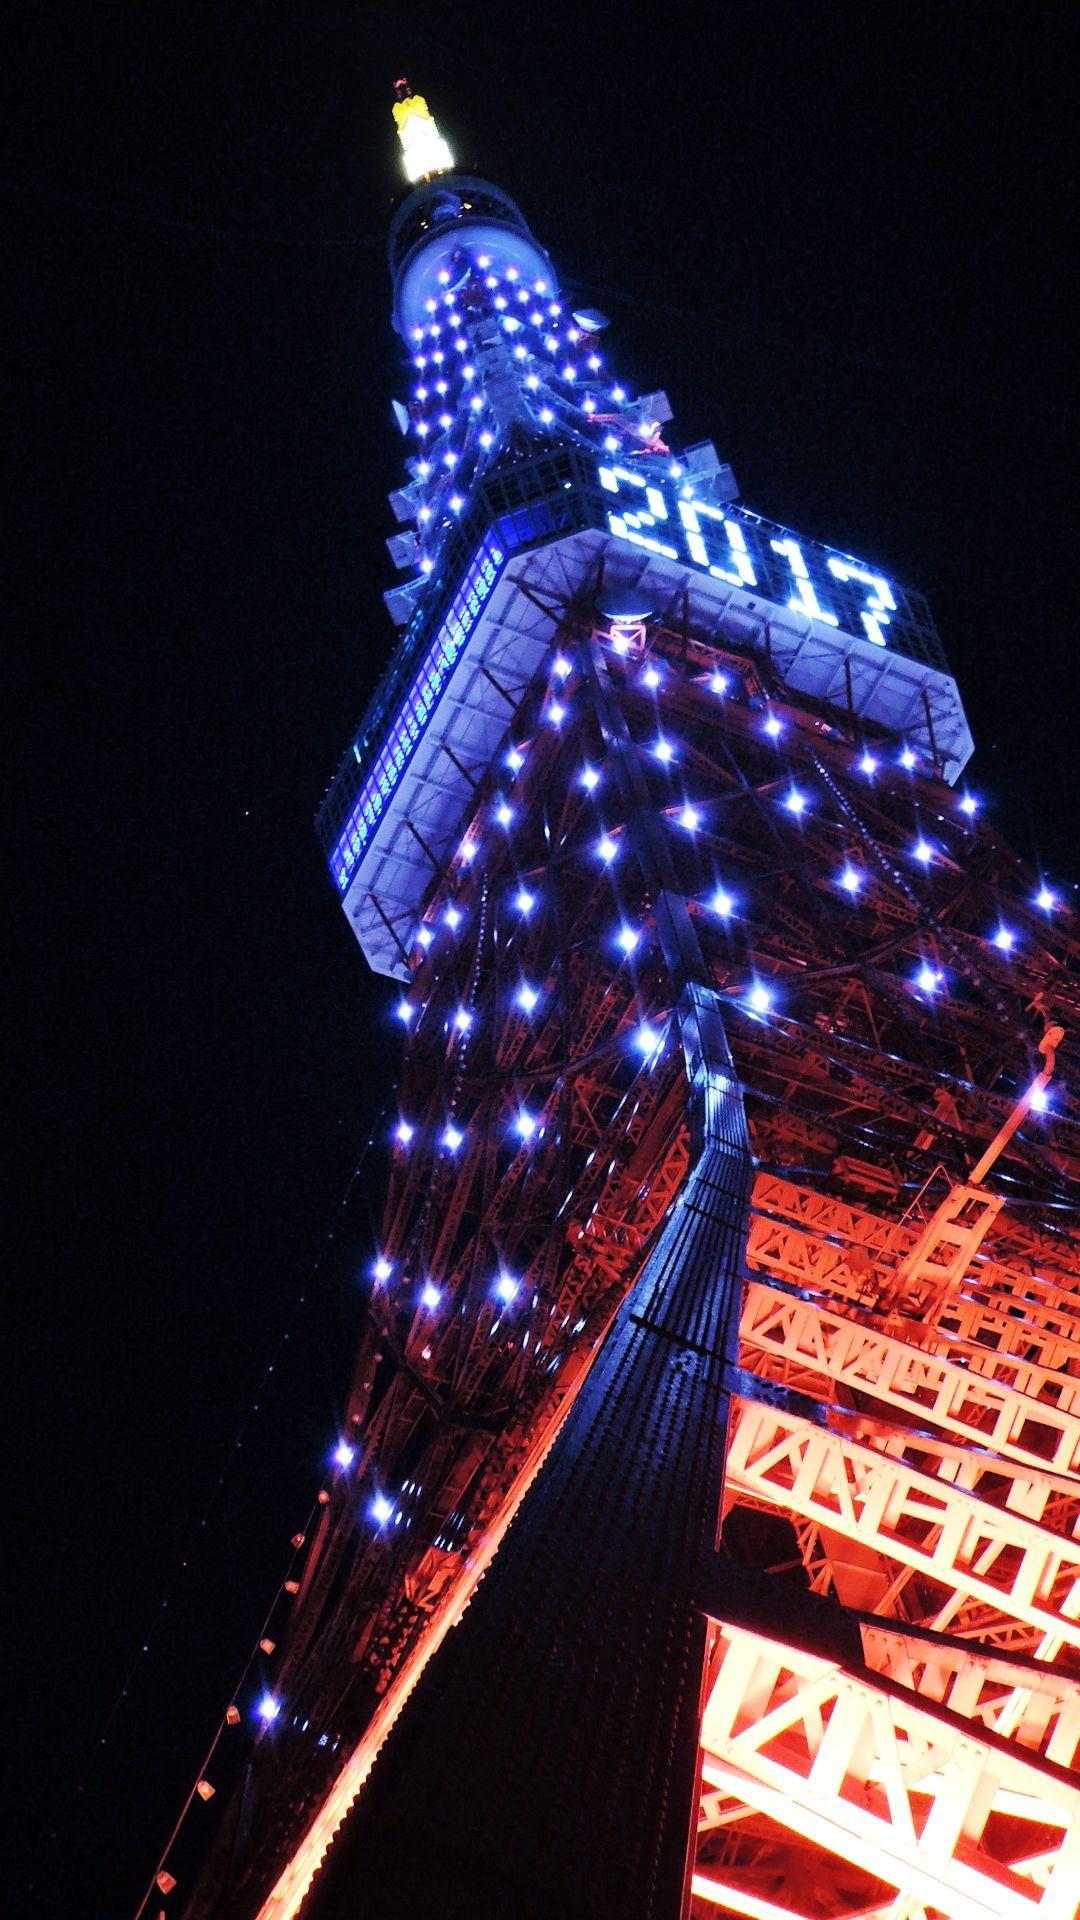 2017-01-01 Tokyo Tower  ダイヤモンドヴェール照明(^_^)/  #tokyotower #tokyo #夜景 #東京タワー